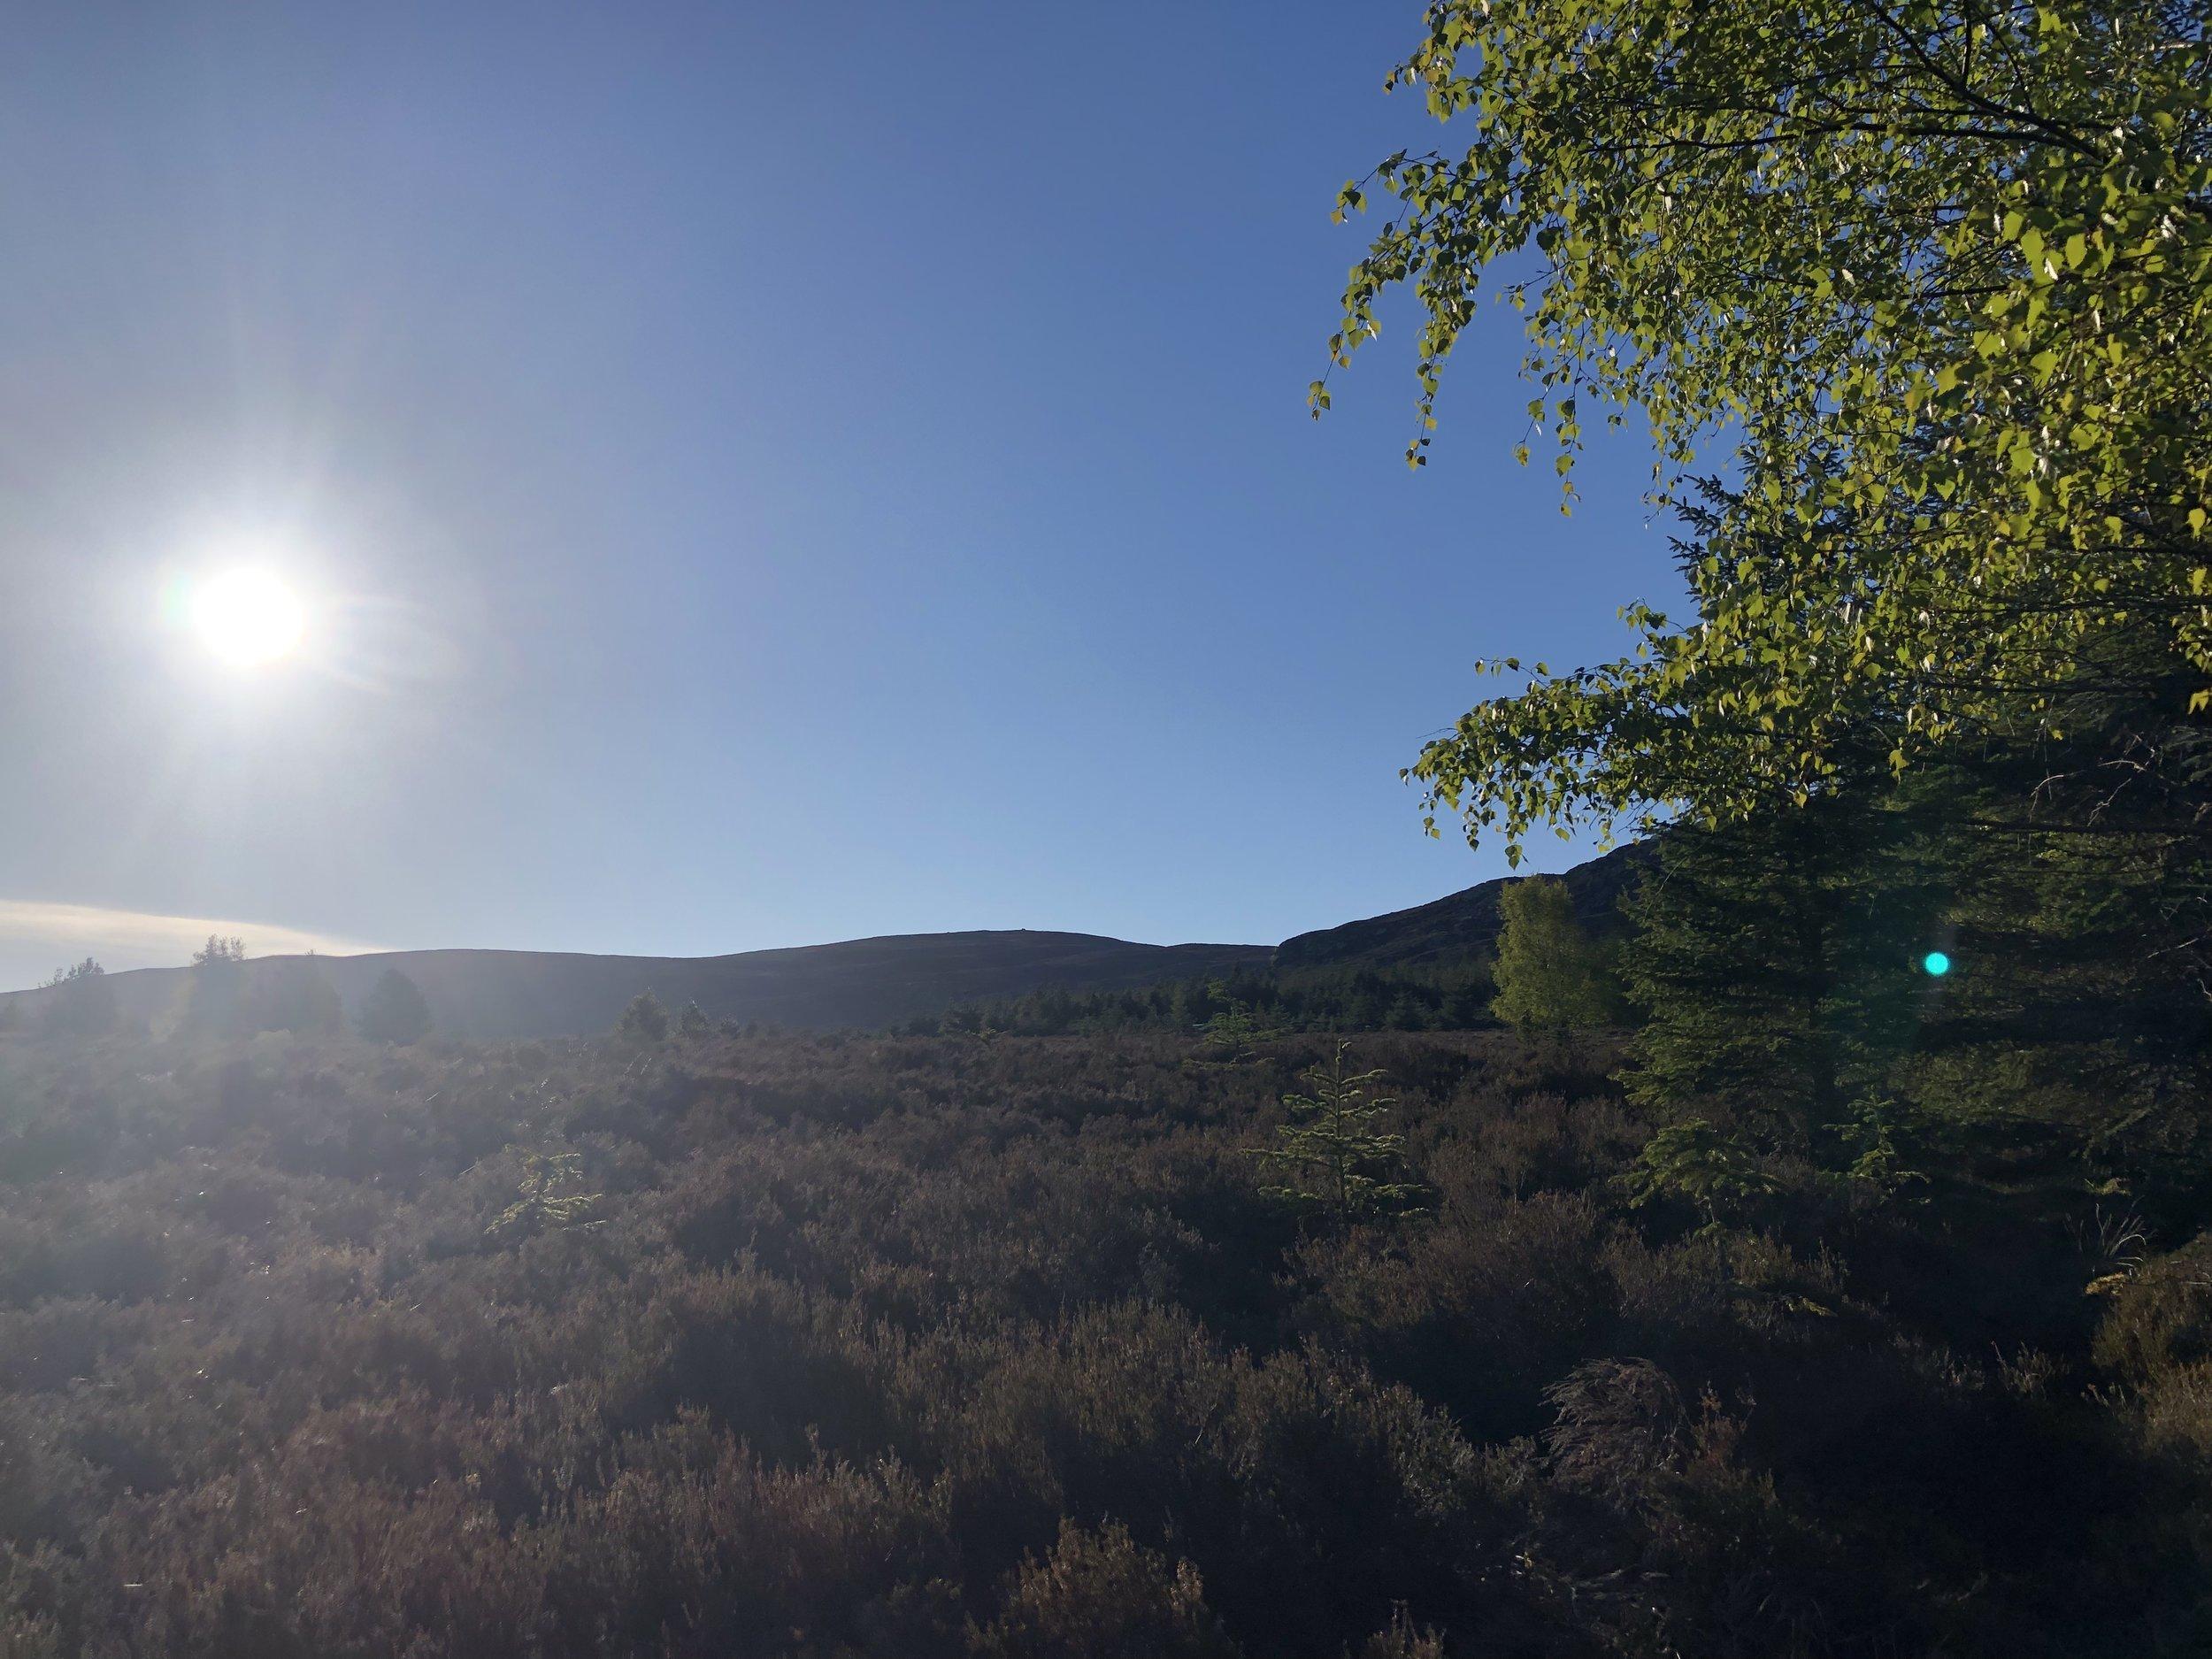 looking up to Beinn dubh and beinn nan cailleach - bird song and blue skies